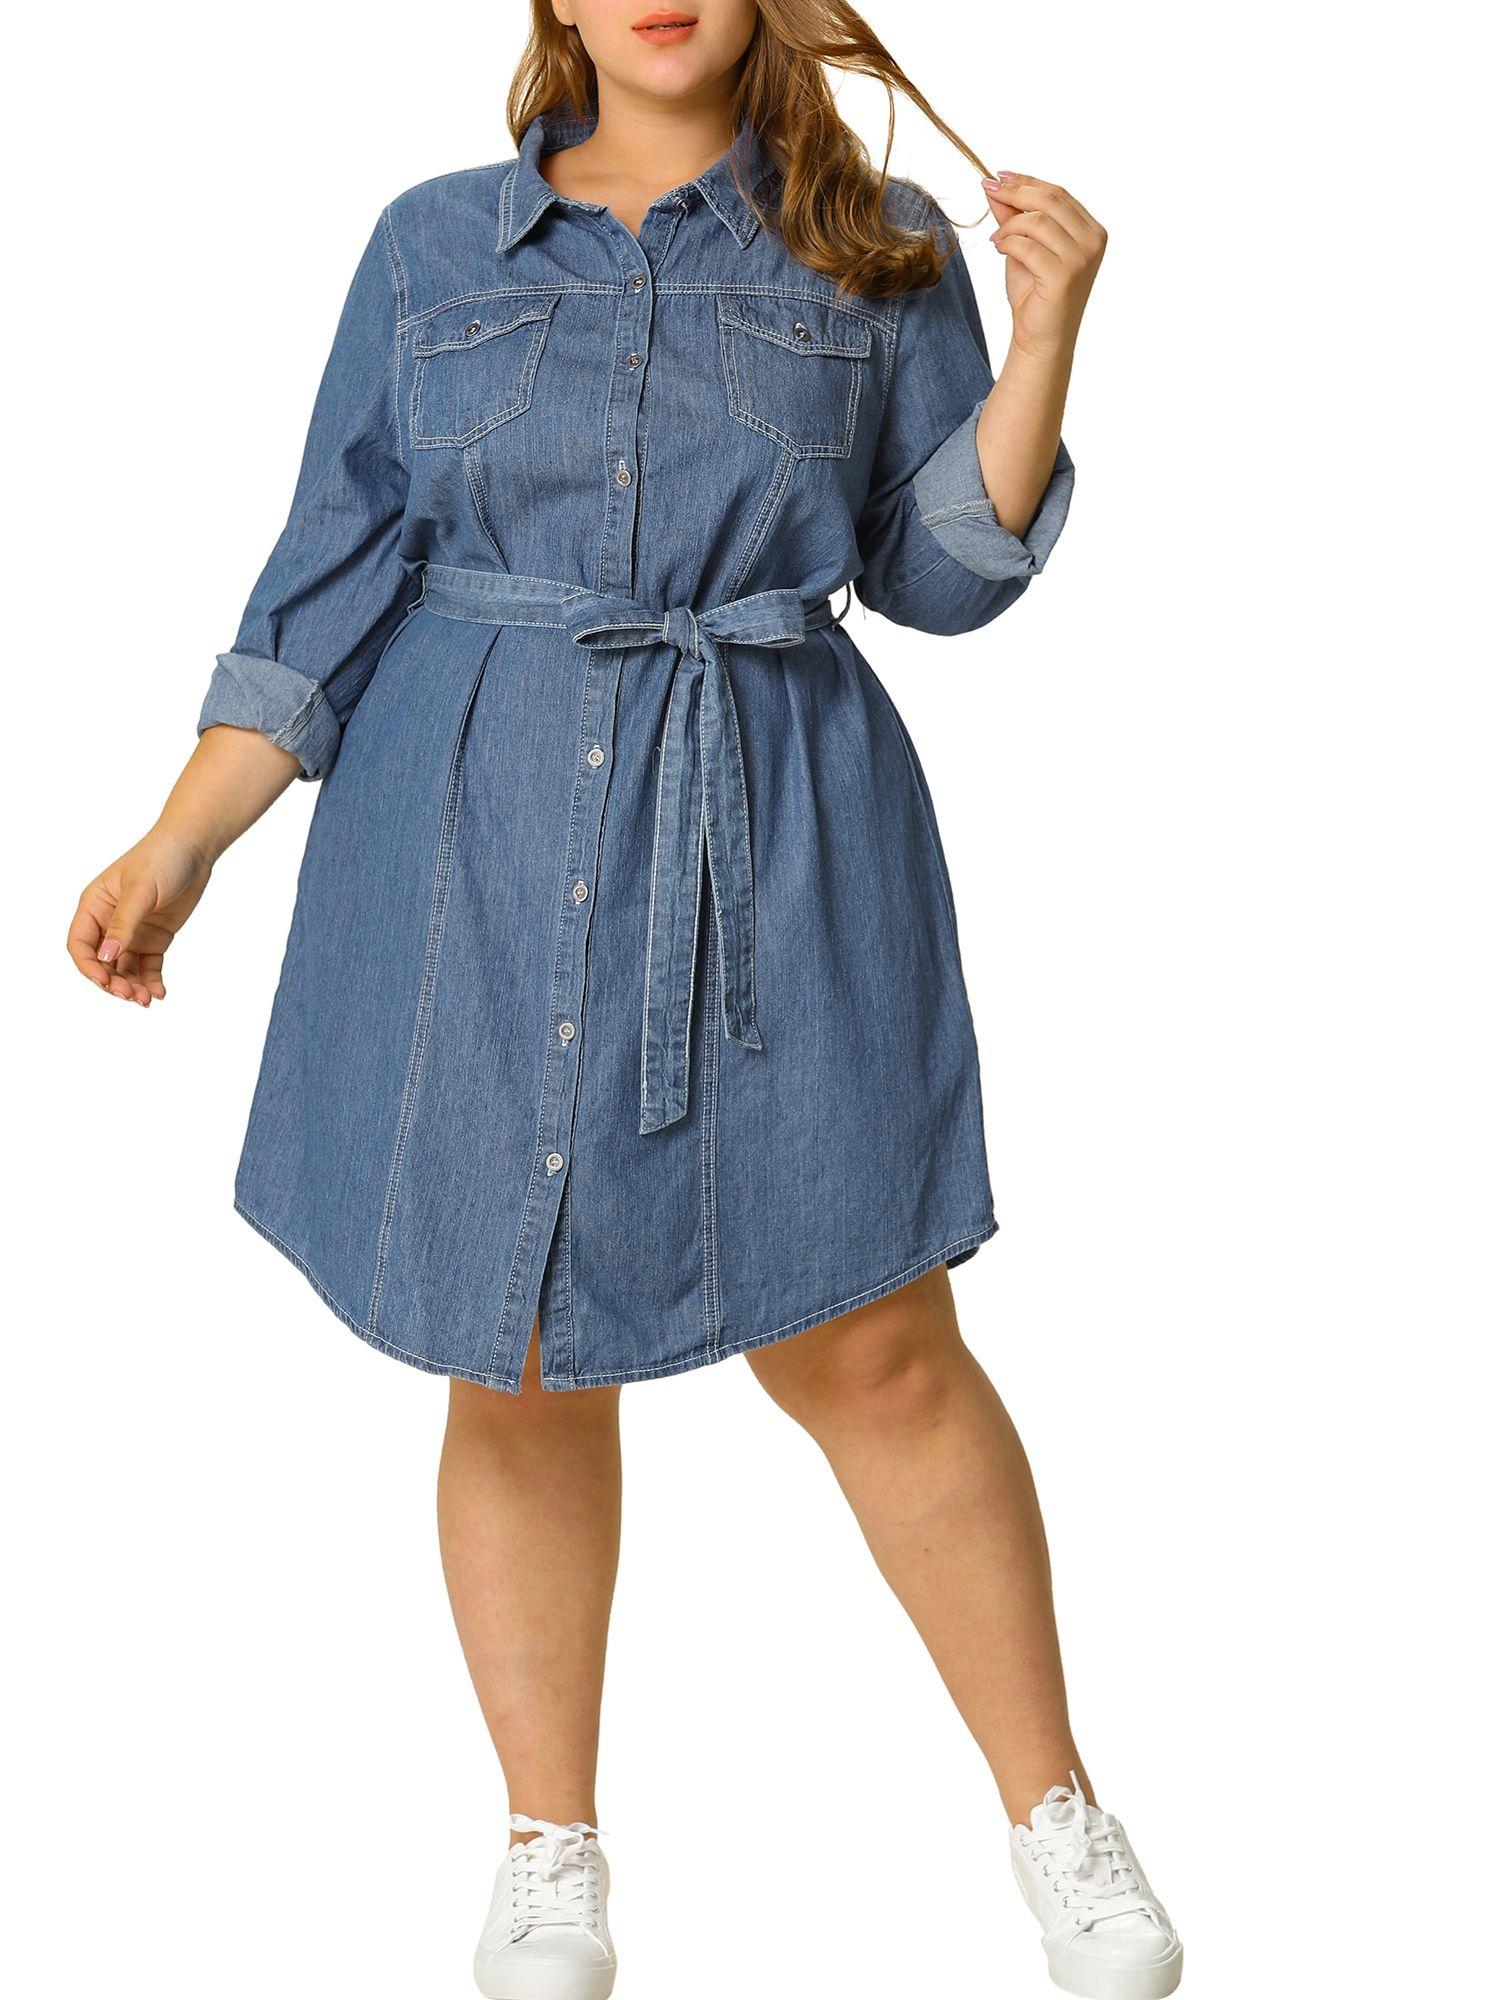 Unique Bargains - Women's Plus Size Long Sleeve Belted Above Knee ...